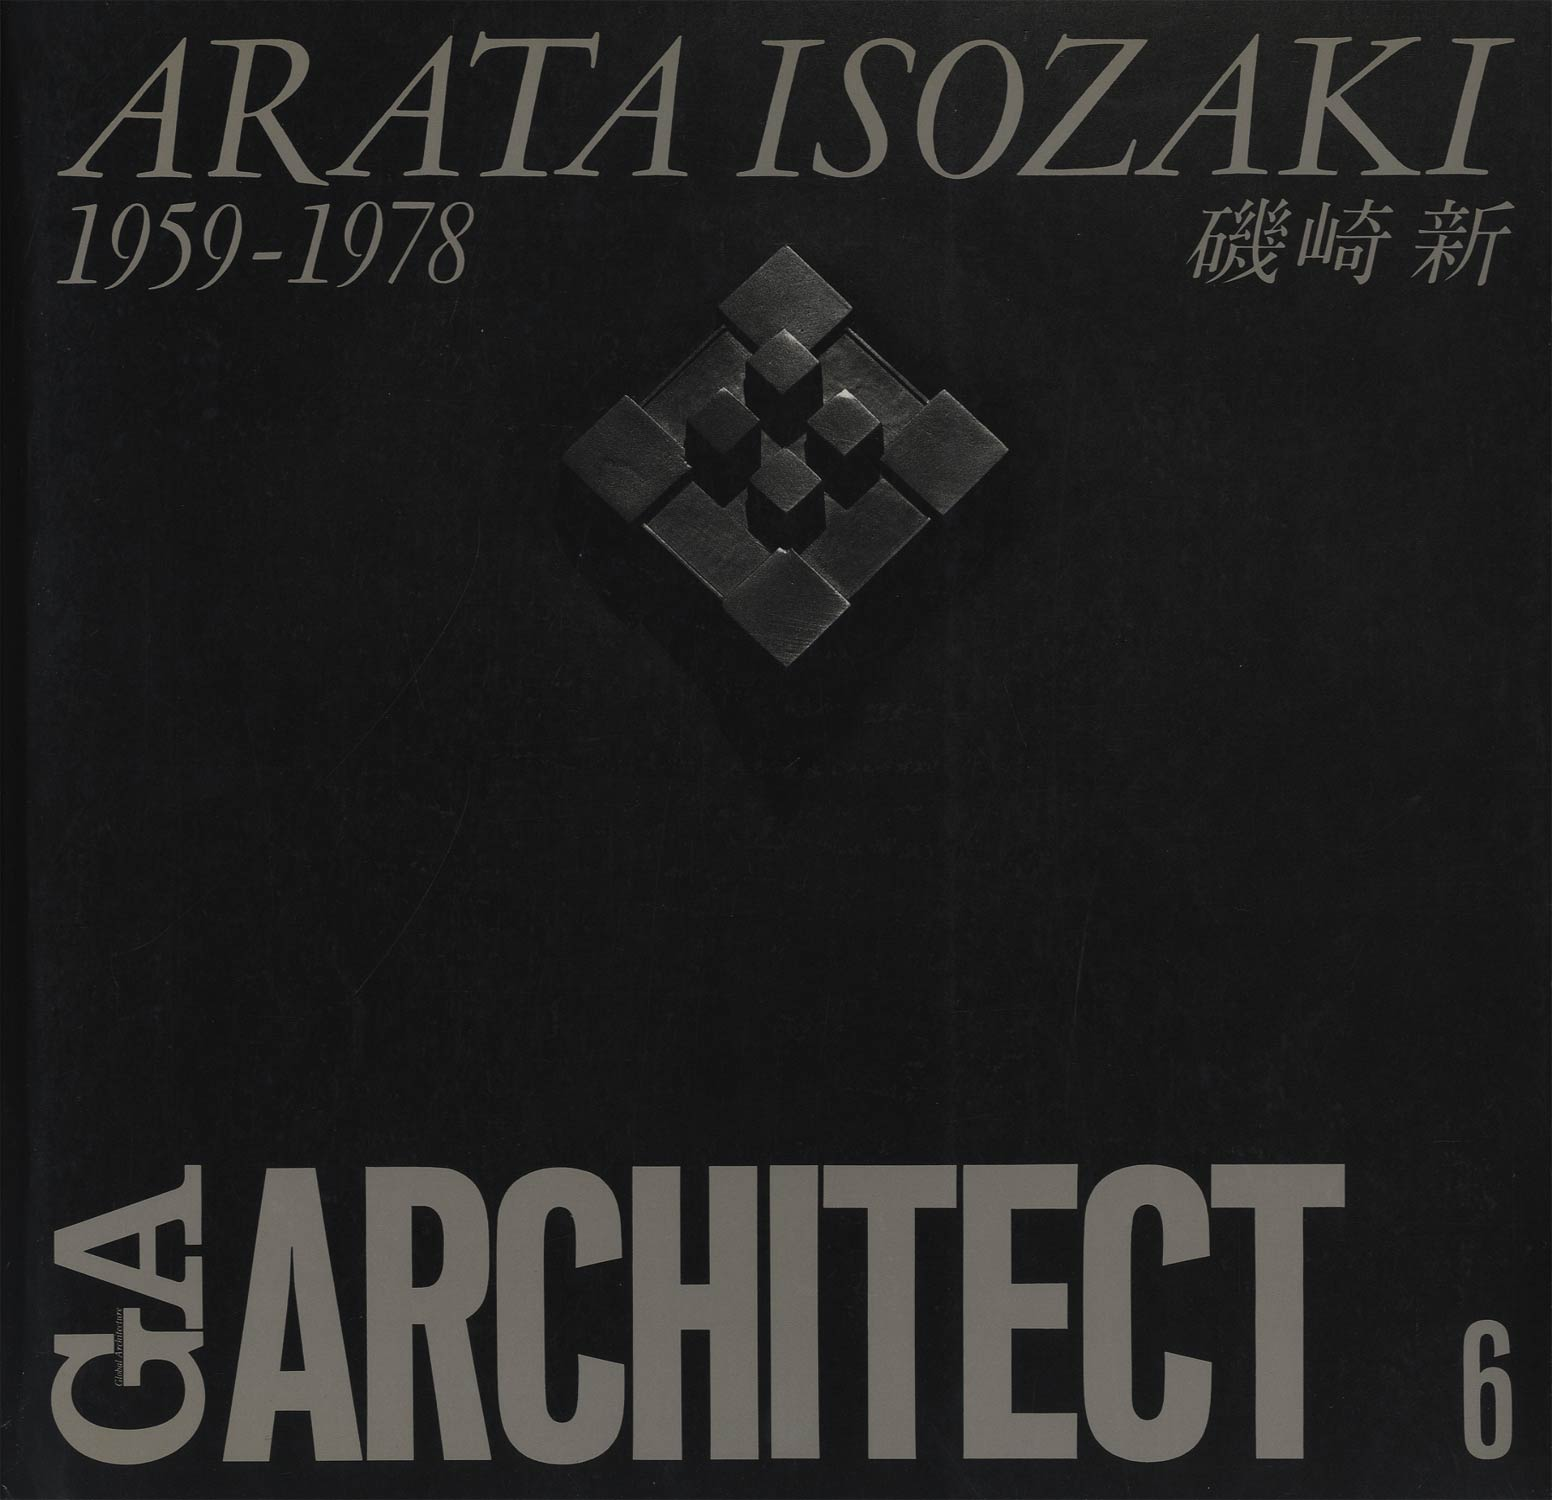 GA ARCHITECT 世界の建築家 6/ARATA ISOZAKI 磯崎新 VOL.1 1959-1978